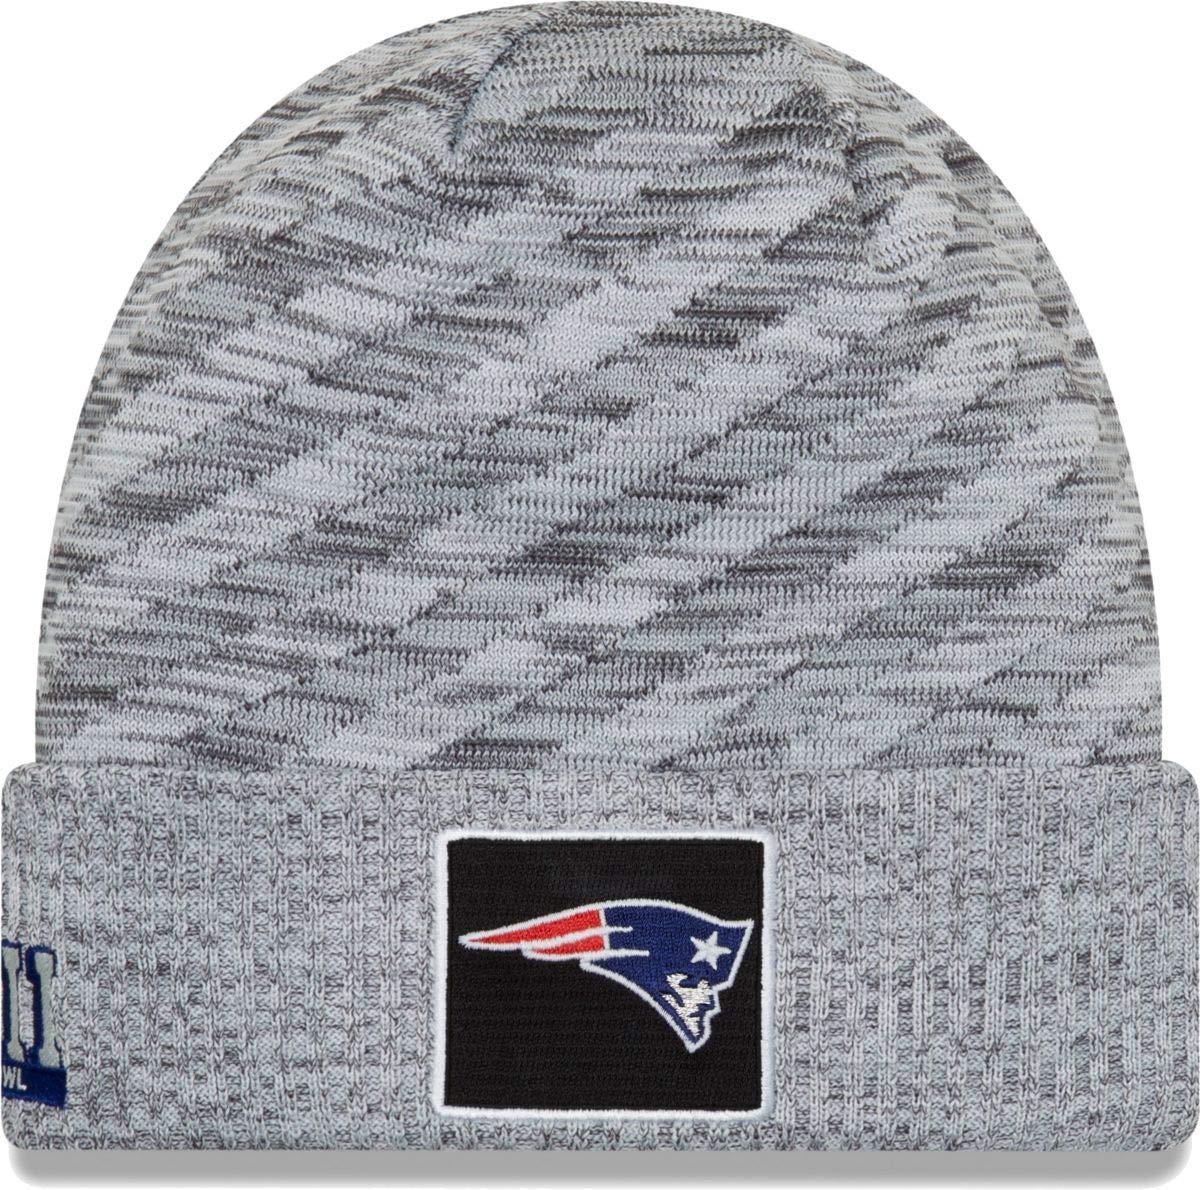 15380286f10d3c Amazon.com : New Era New England Patriots Super Bowl LIII Bound On-Field  Knit- Light Gray : Sports & Outdoors